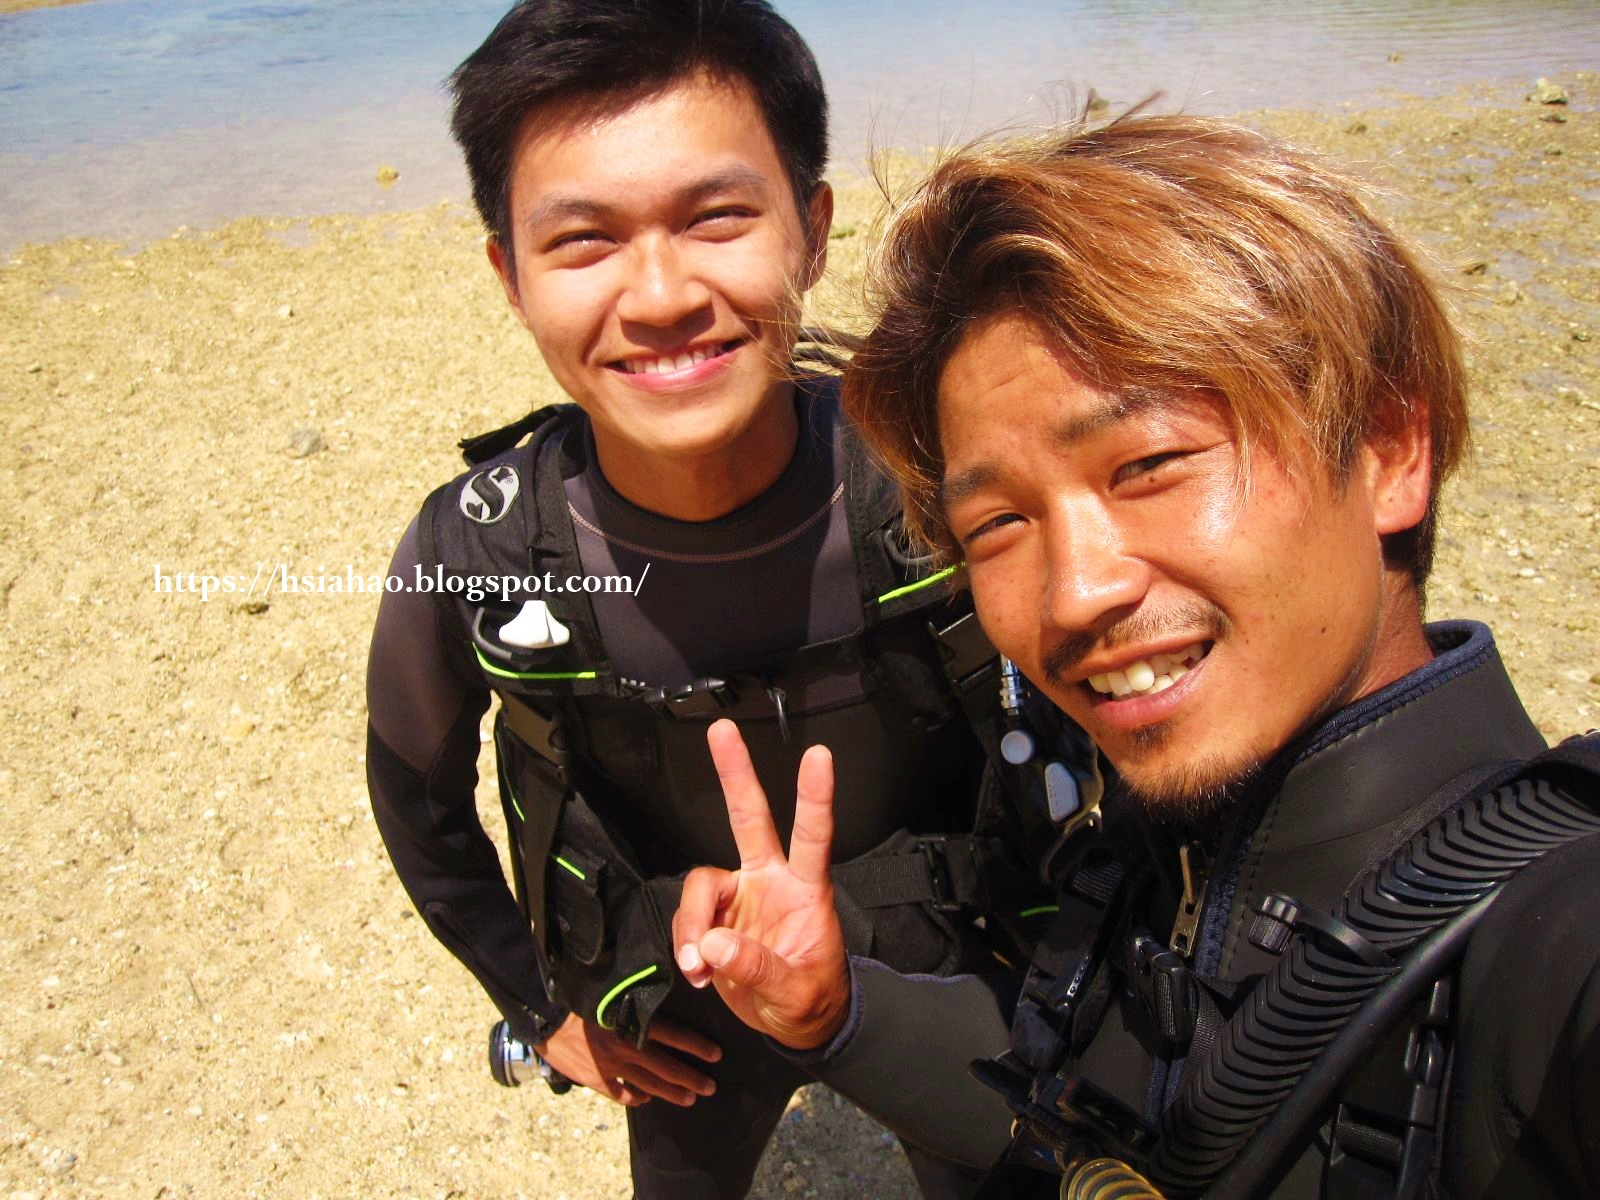 沖繩-推薦-Pink-Mermaid-真榮田岬-青之洞窟-潛水-浮潛-青の洞窟-自由行-旅遊-Okinawa-diving-snorkeling-maeda-cape-blue-cave